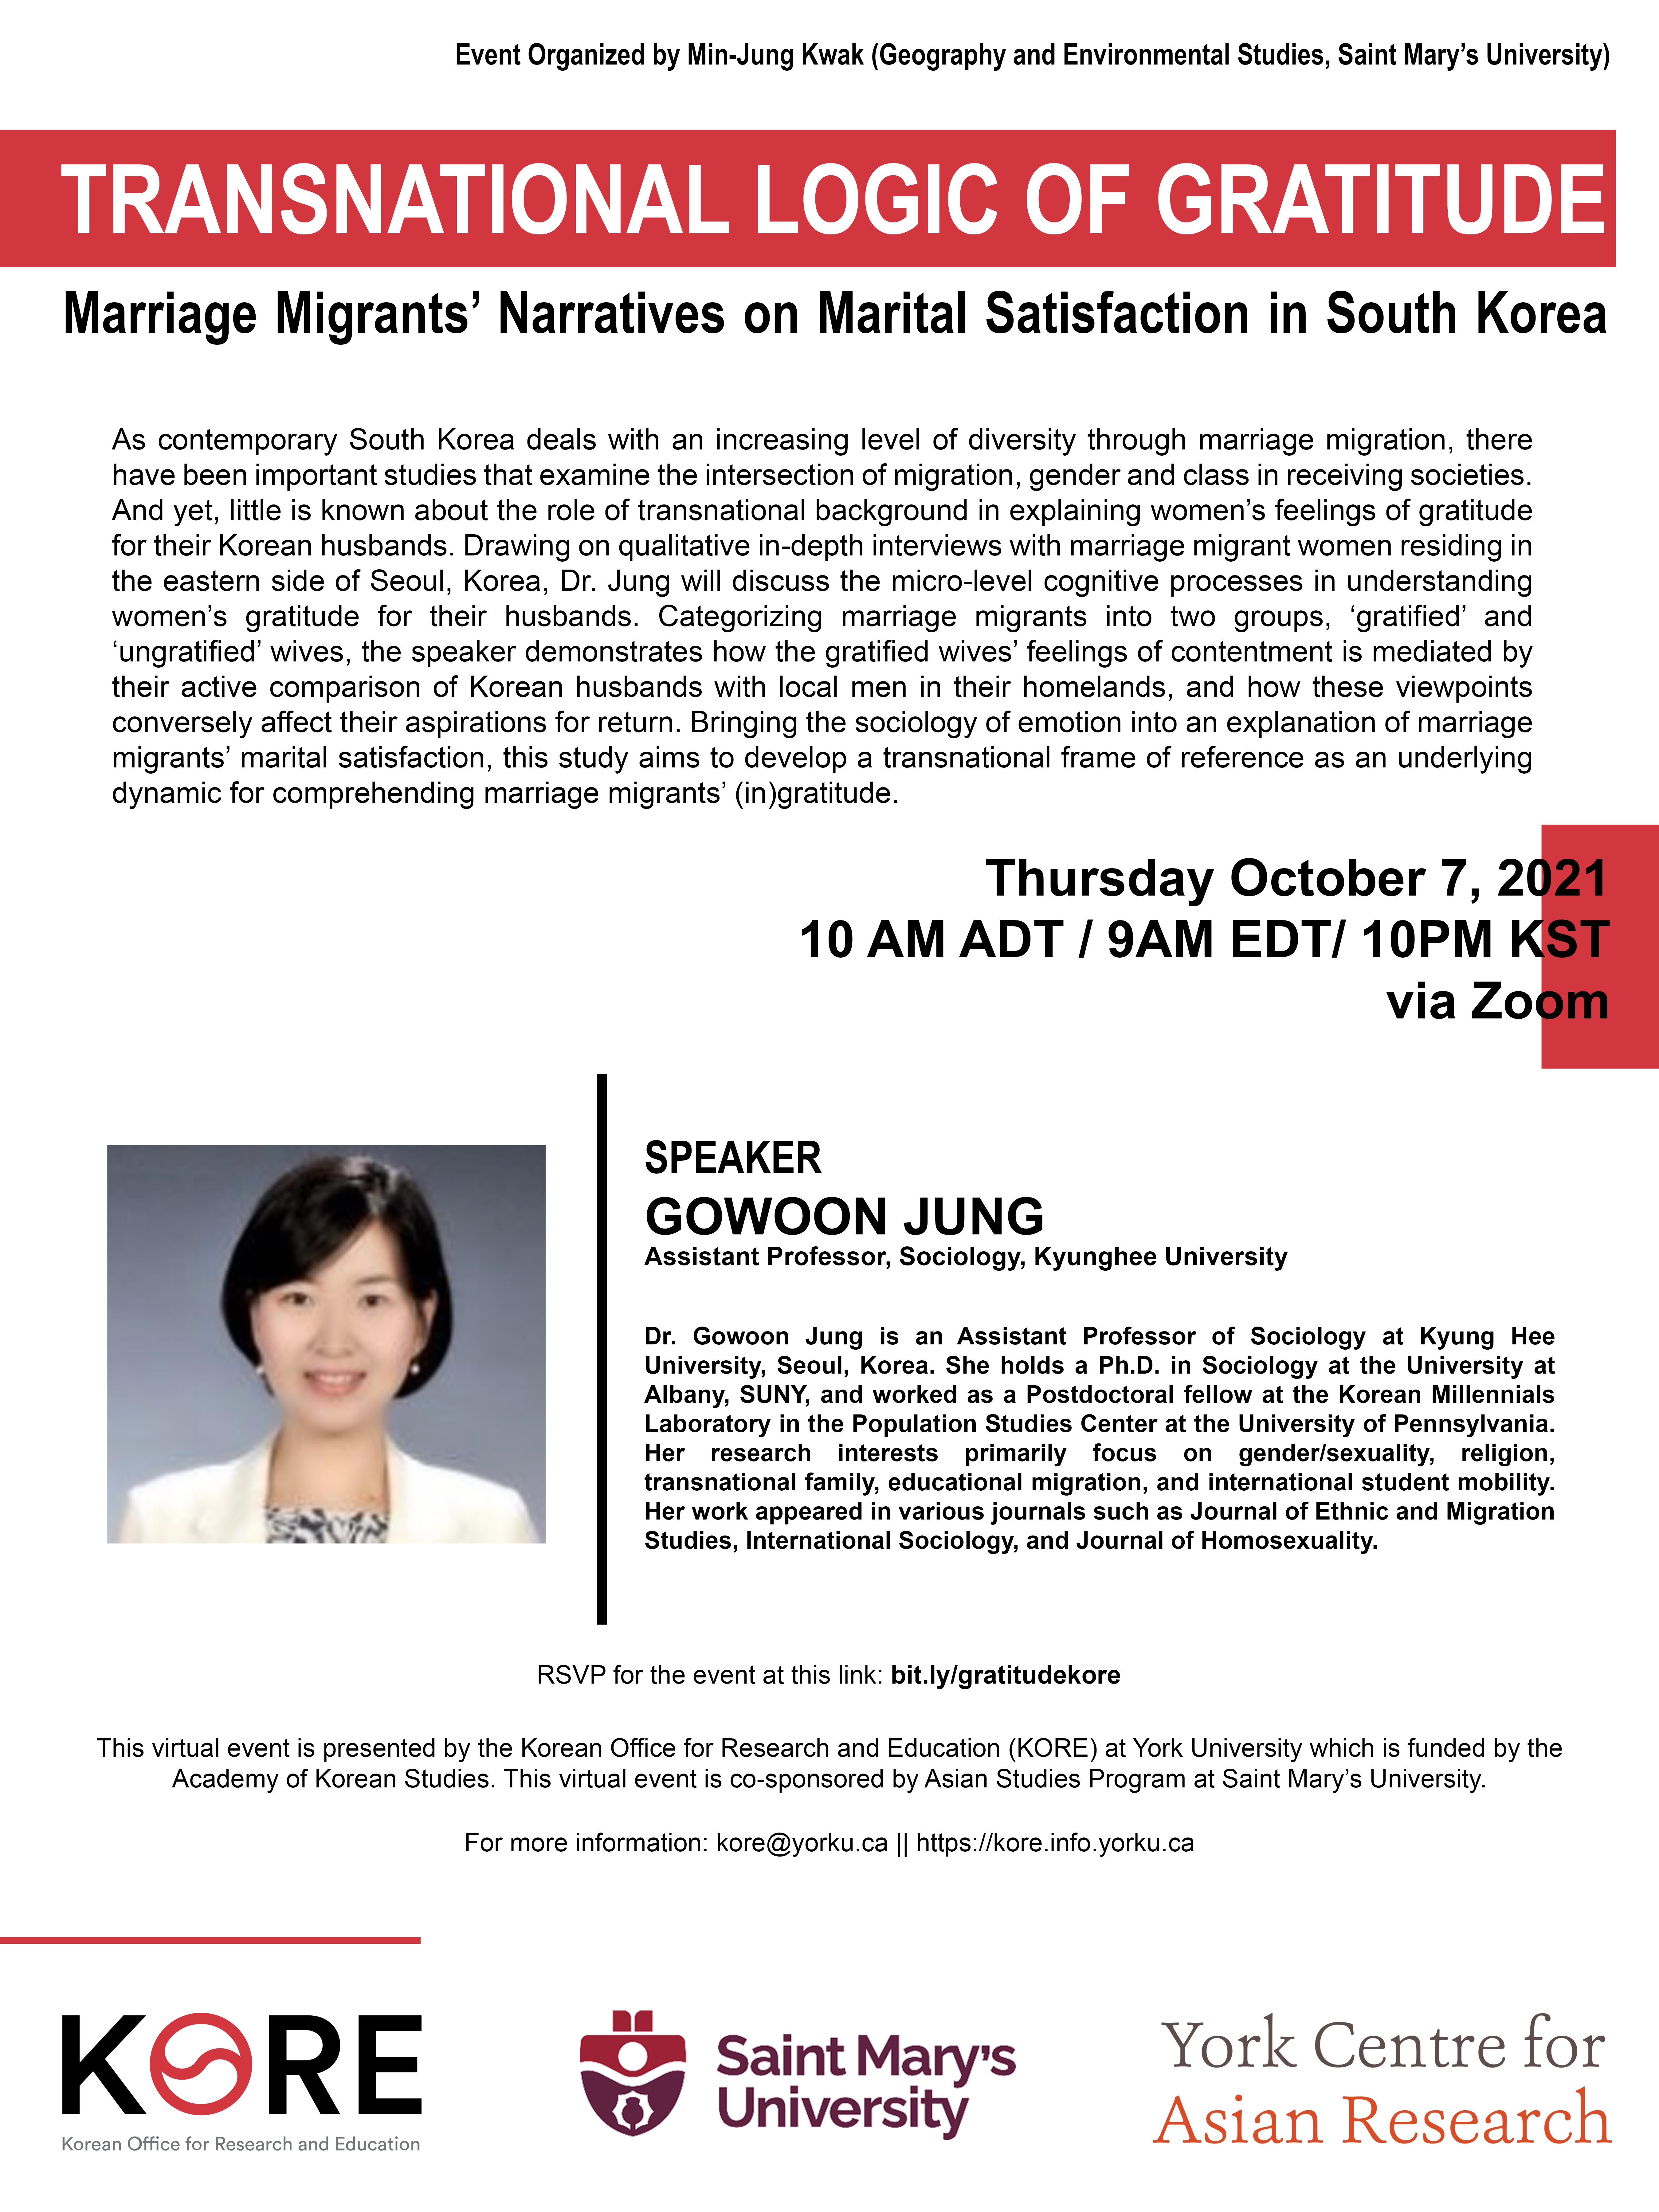 Transnational logic of gratitude:  Marriage migrants' narratives on marital satisfaction in South Korea